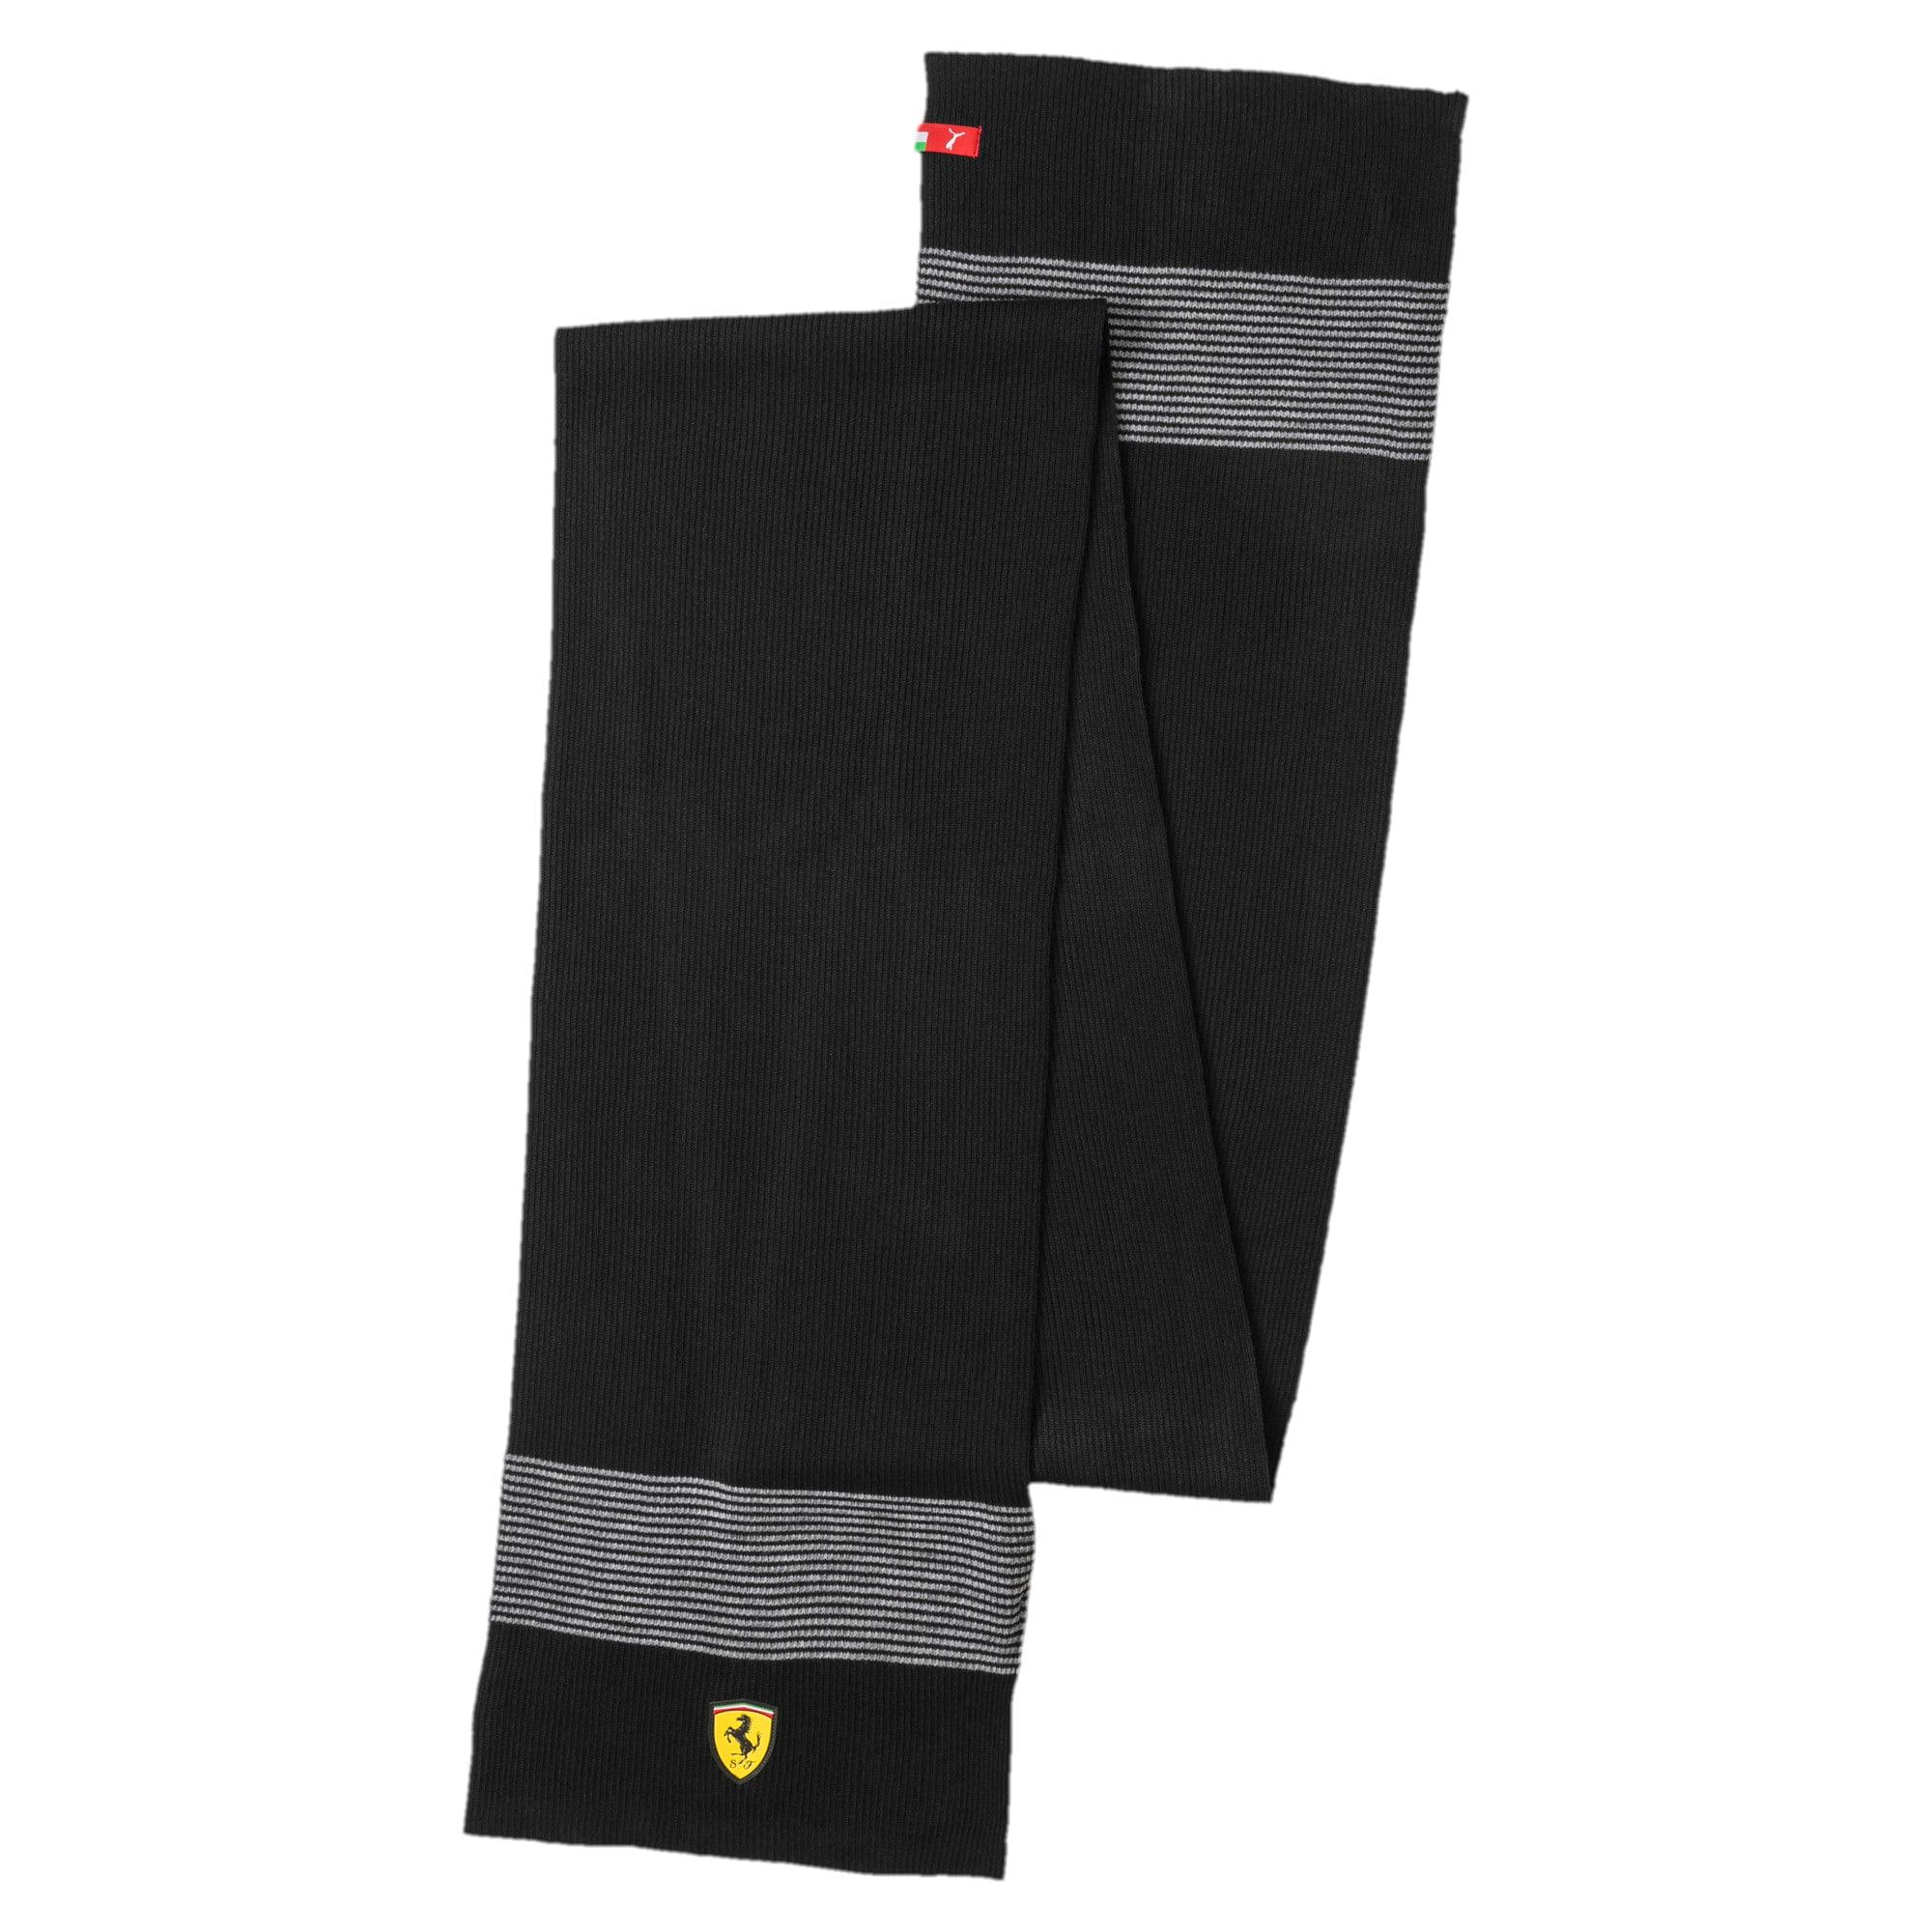 Thumbnail 1 of Ferrari Fanwear Scarf, Puma Black, medium